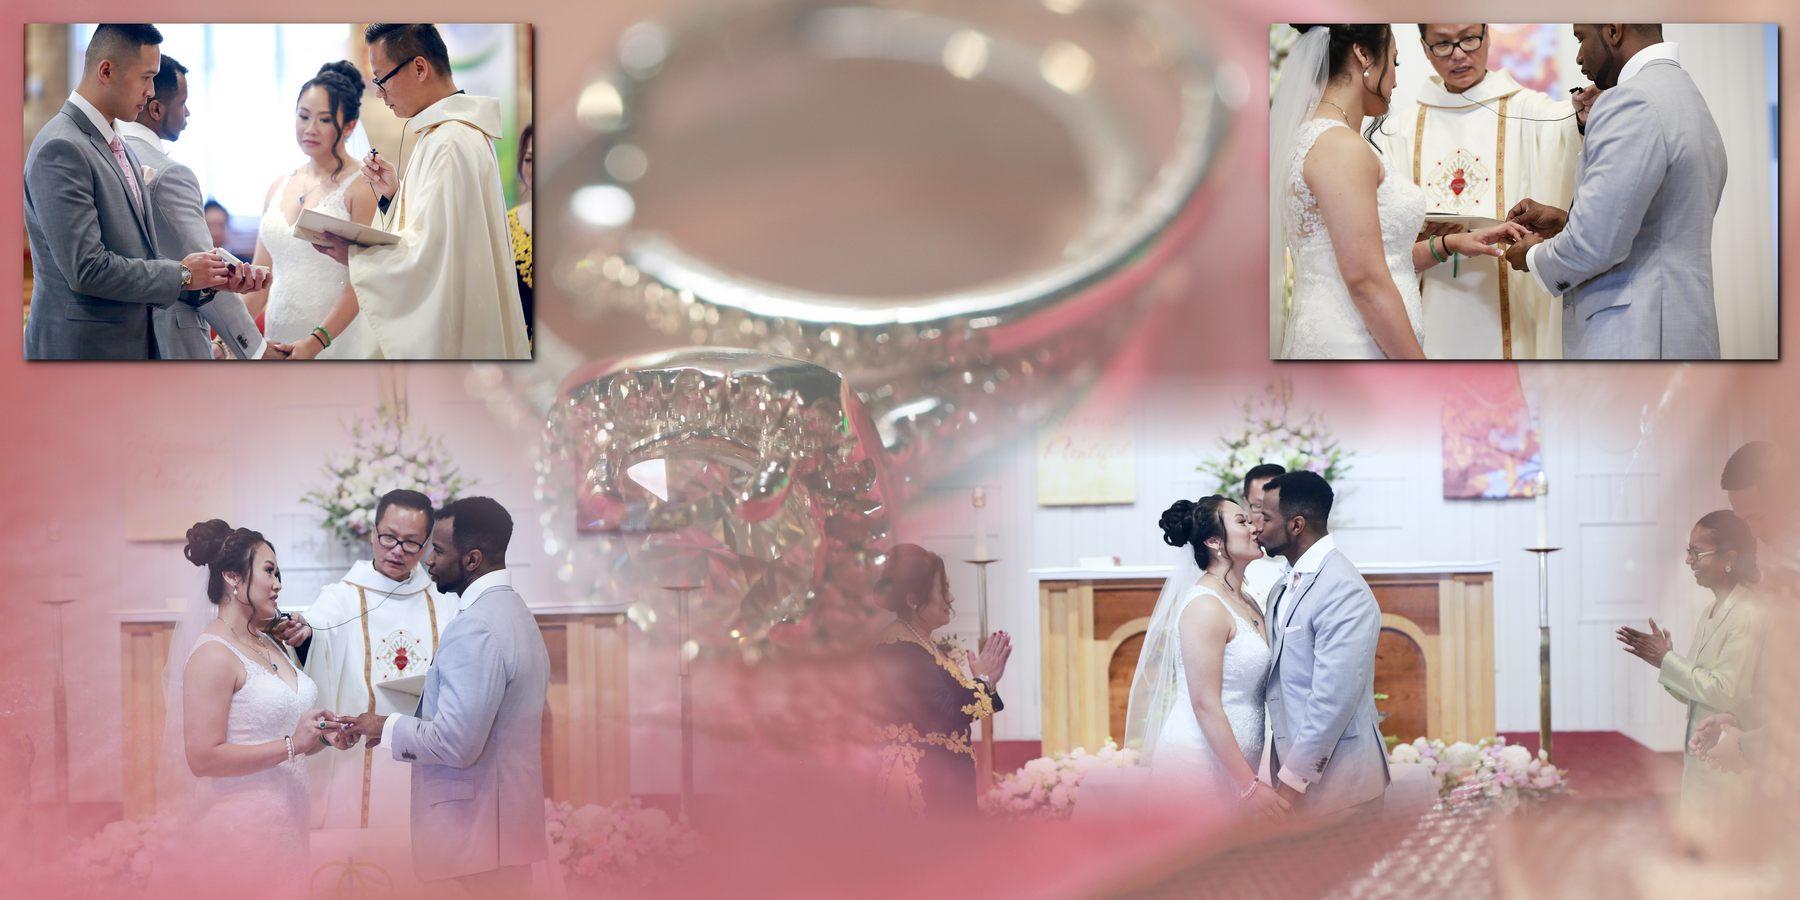 Keneisha wedding album 009 (Sides 16-17)